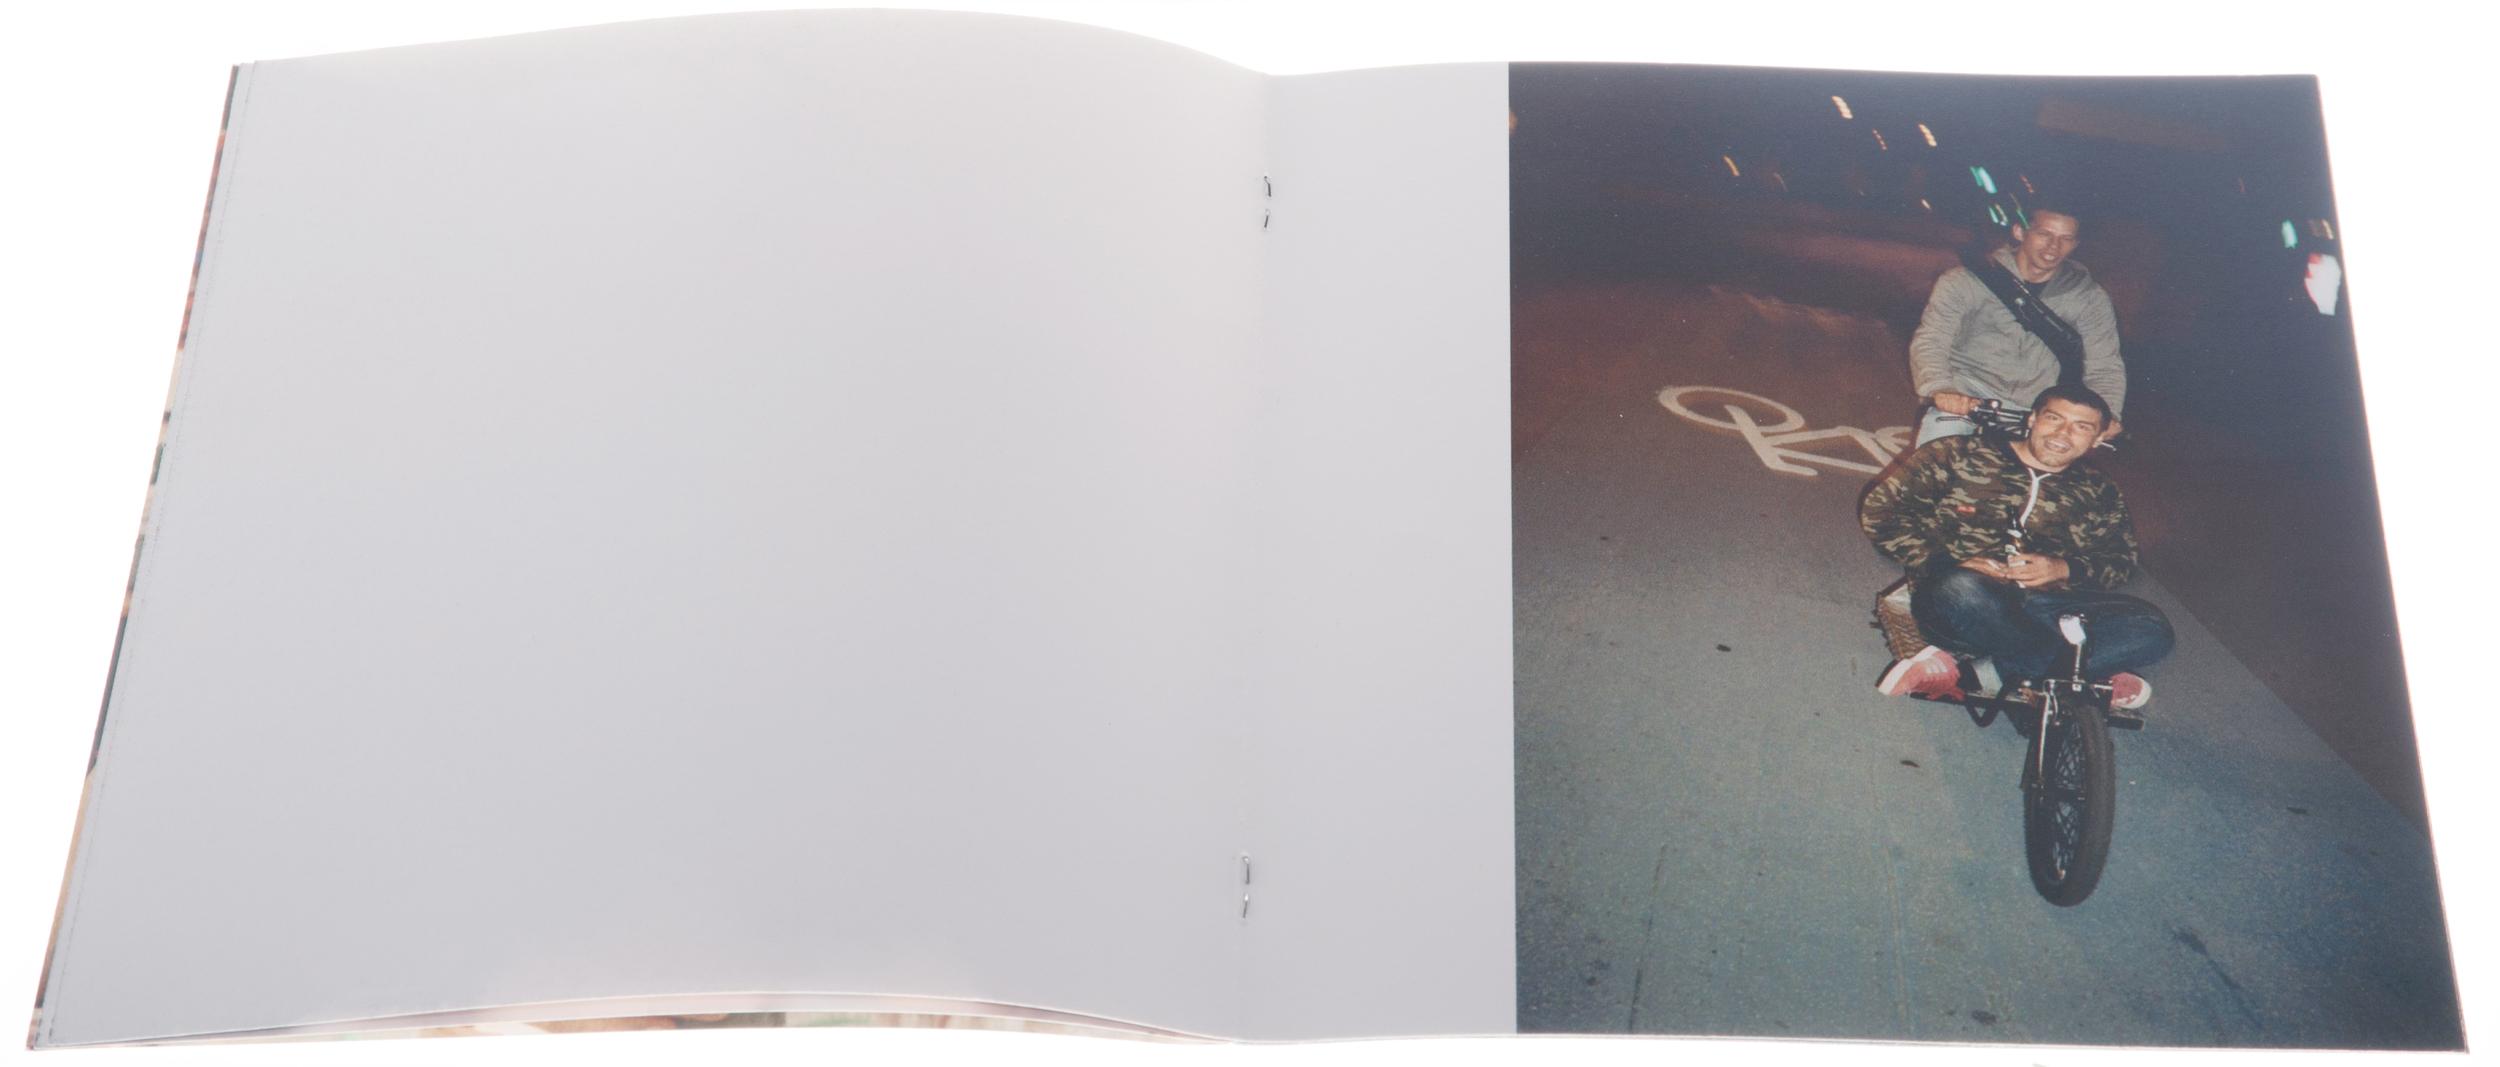 ZinneBoxSet2011-2012_0017-Recovered.jpg